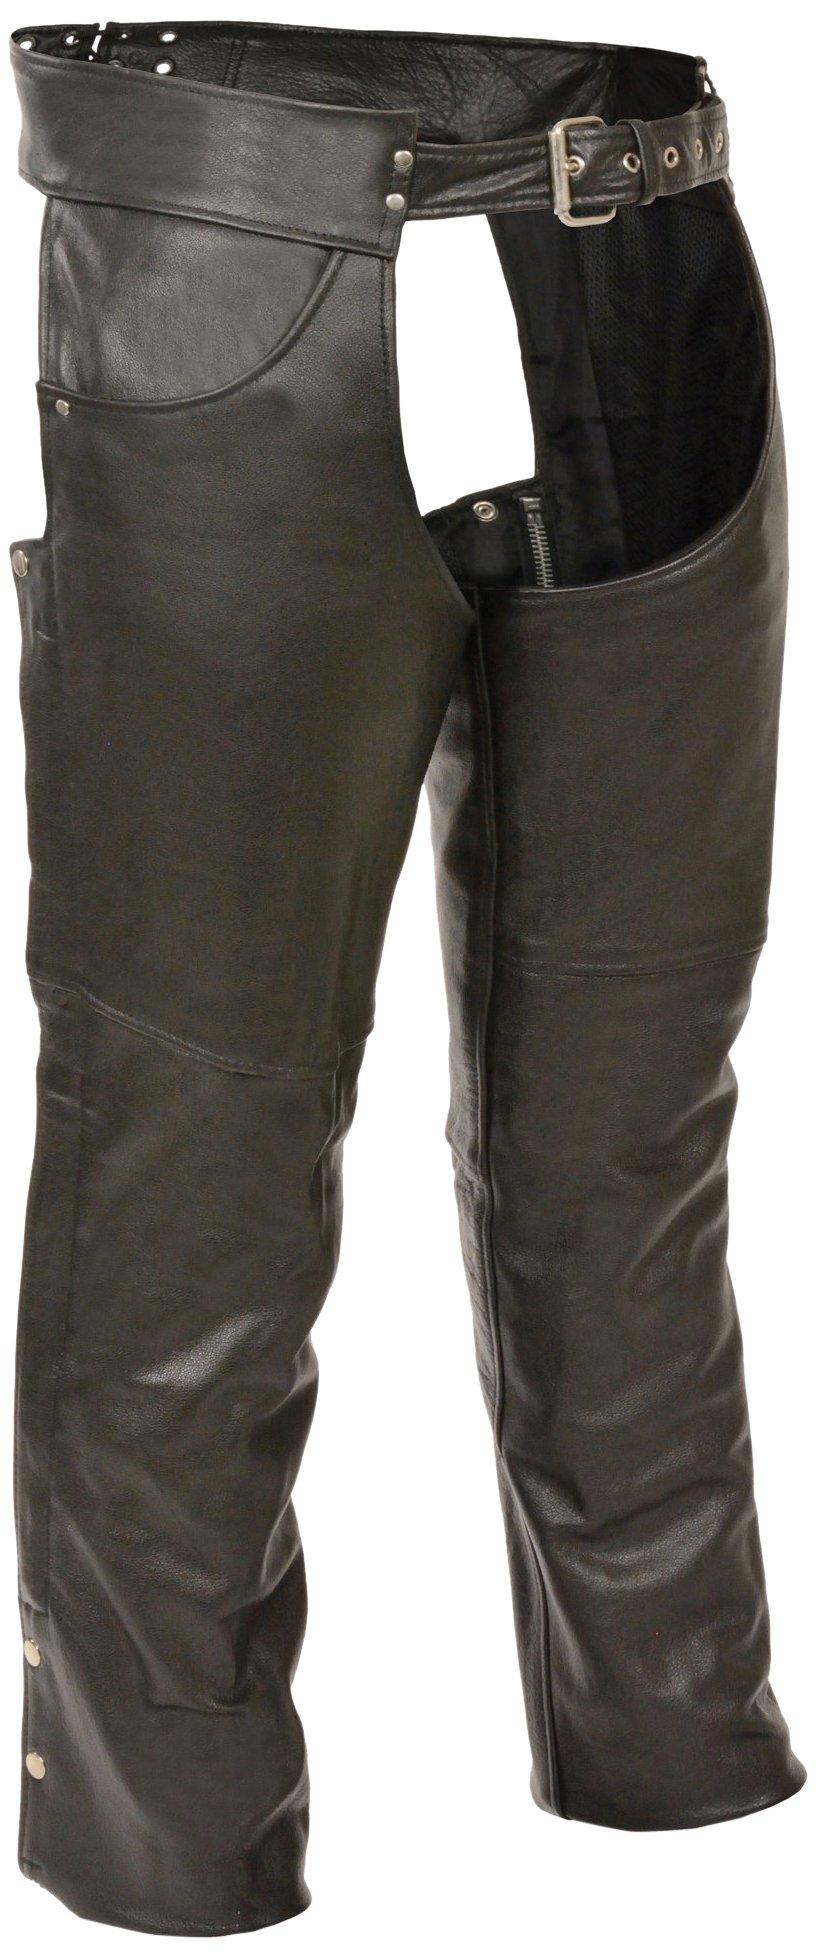 Milwaukee Men's 1.2mm Premium Leather Plain Lined Chaps (Black, XXX-Small)